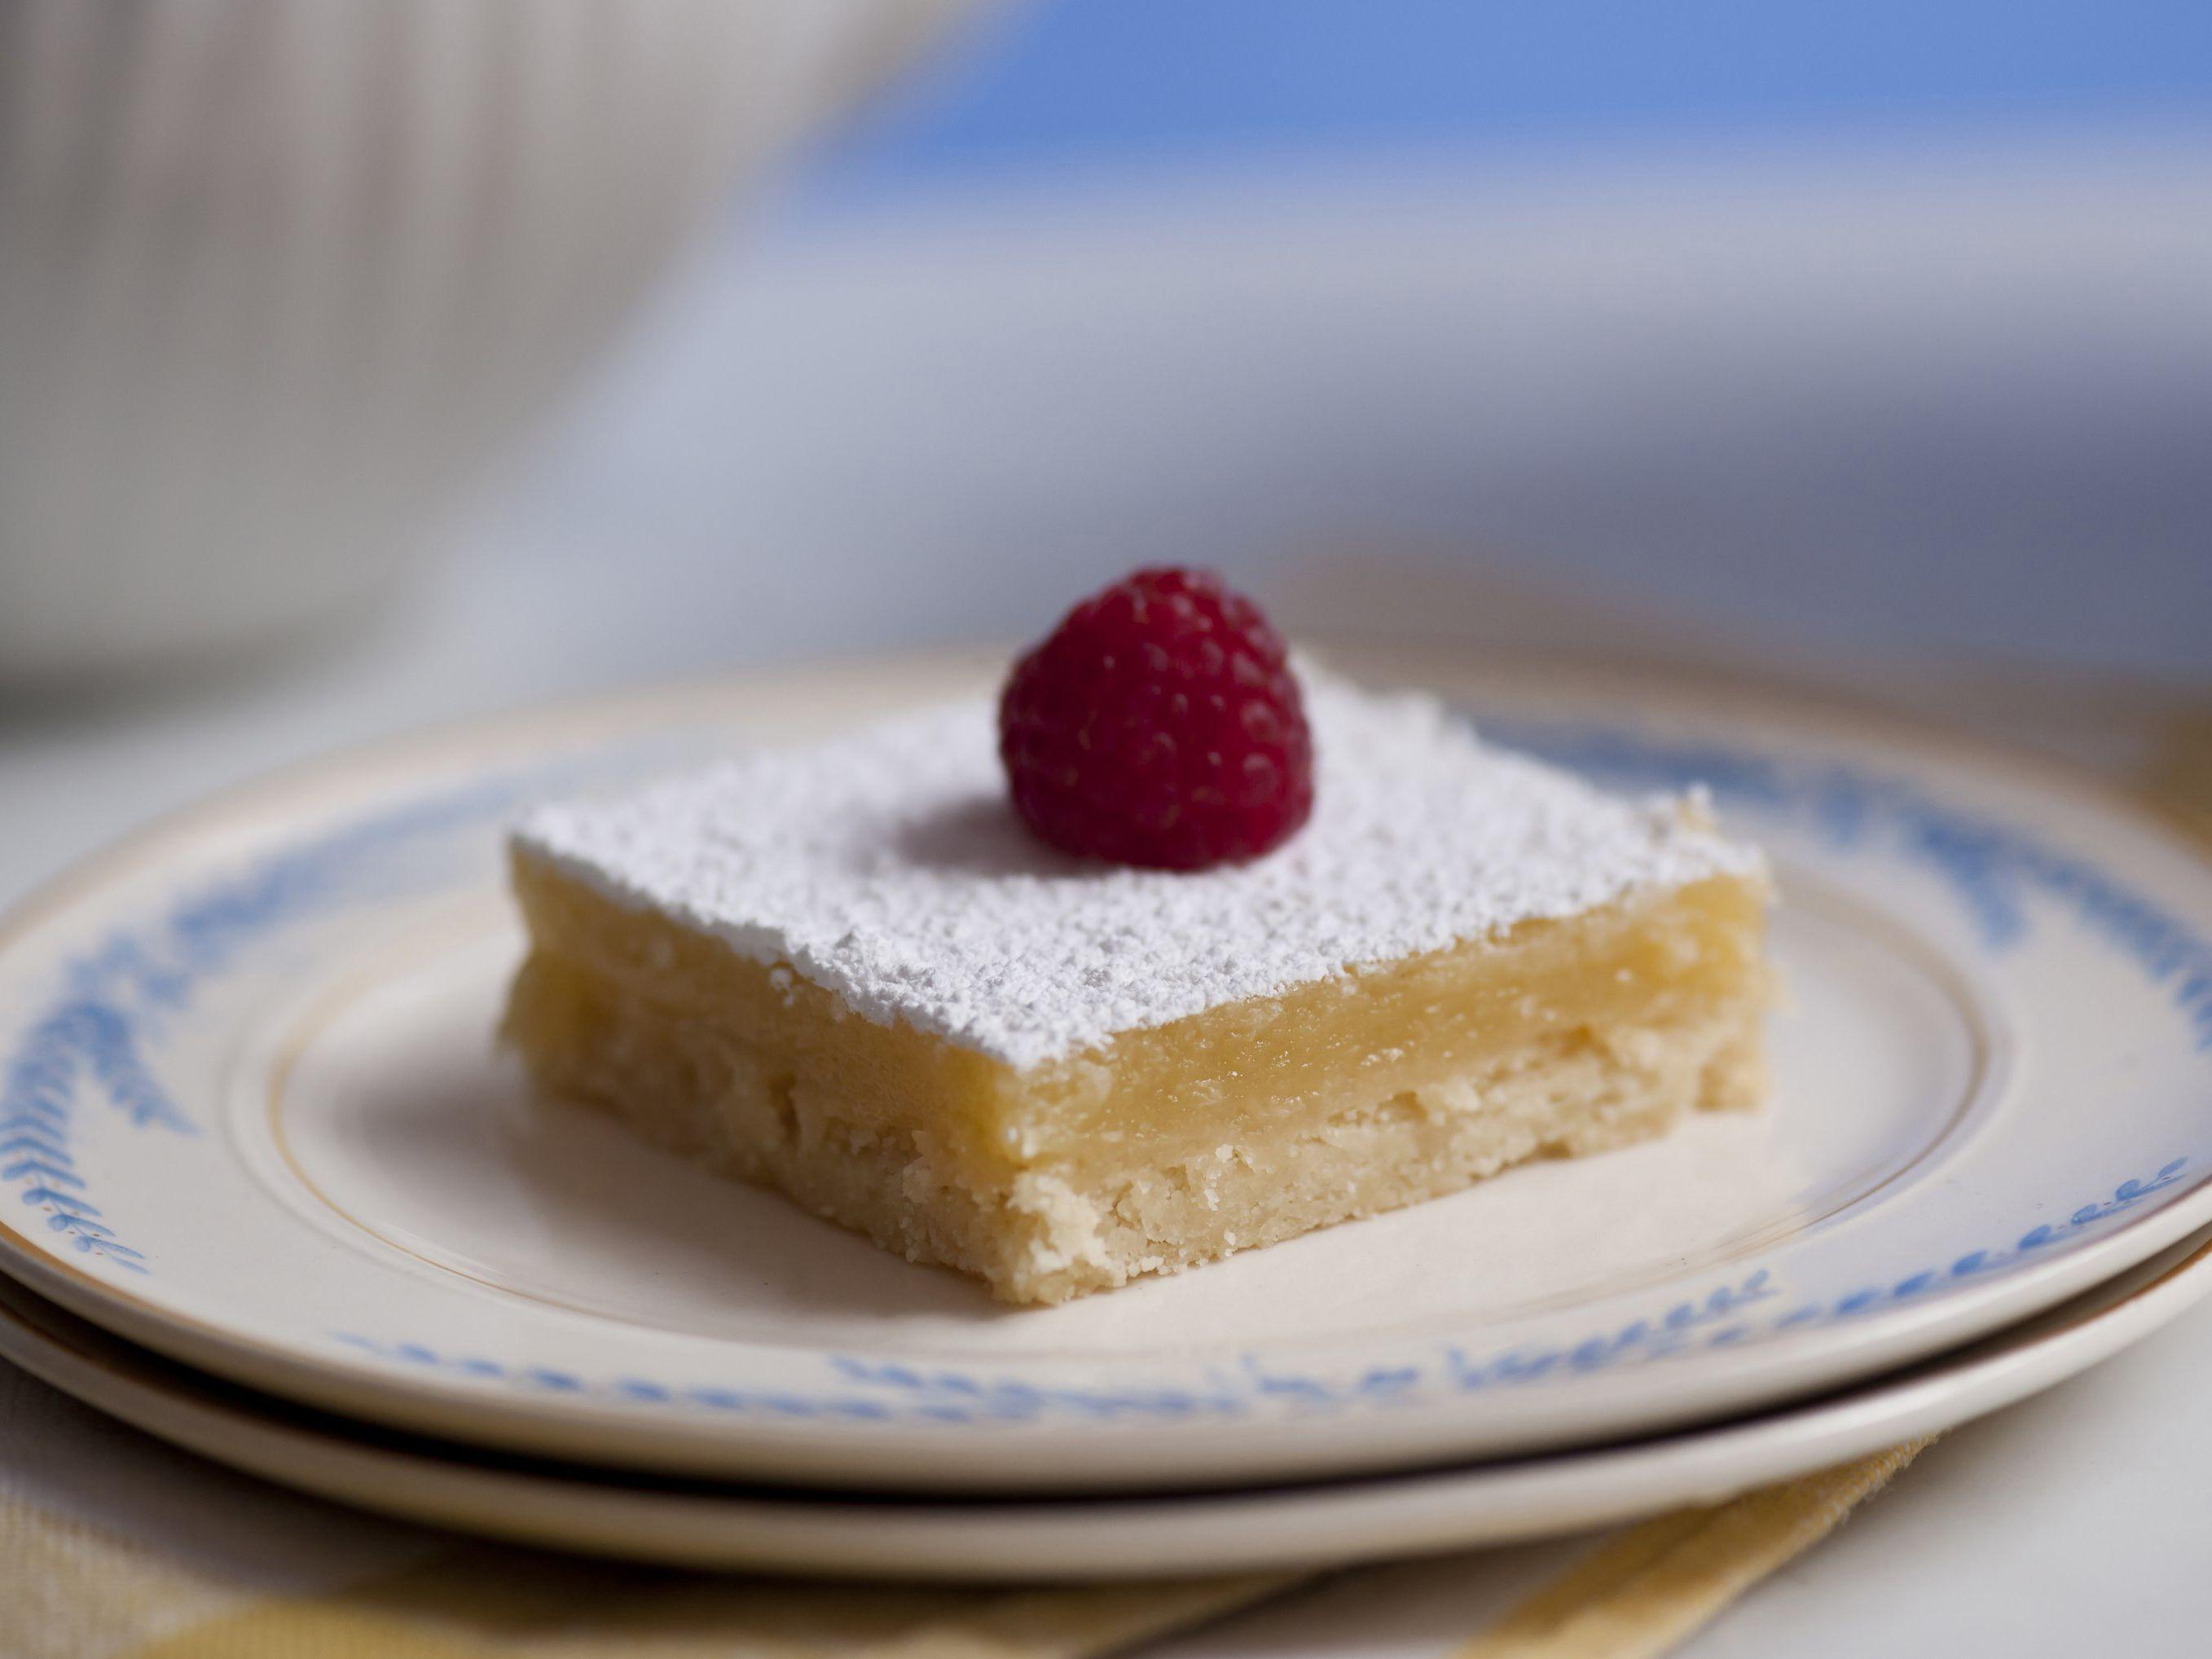 Luscious Lemon Squares from FoodNetwork.com